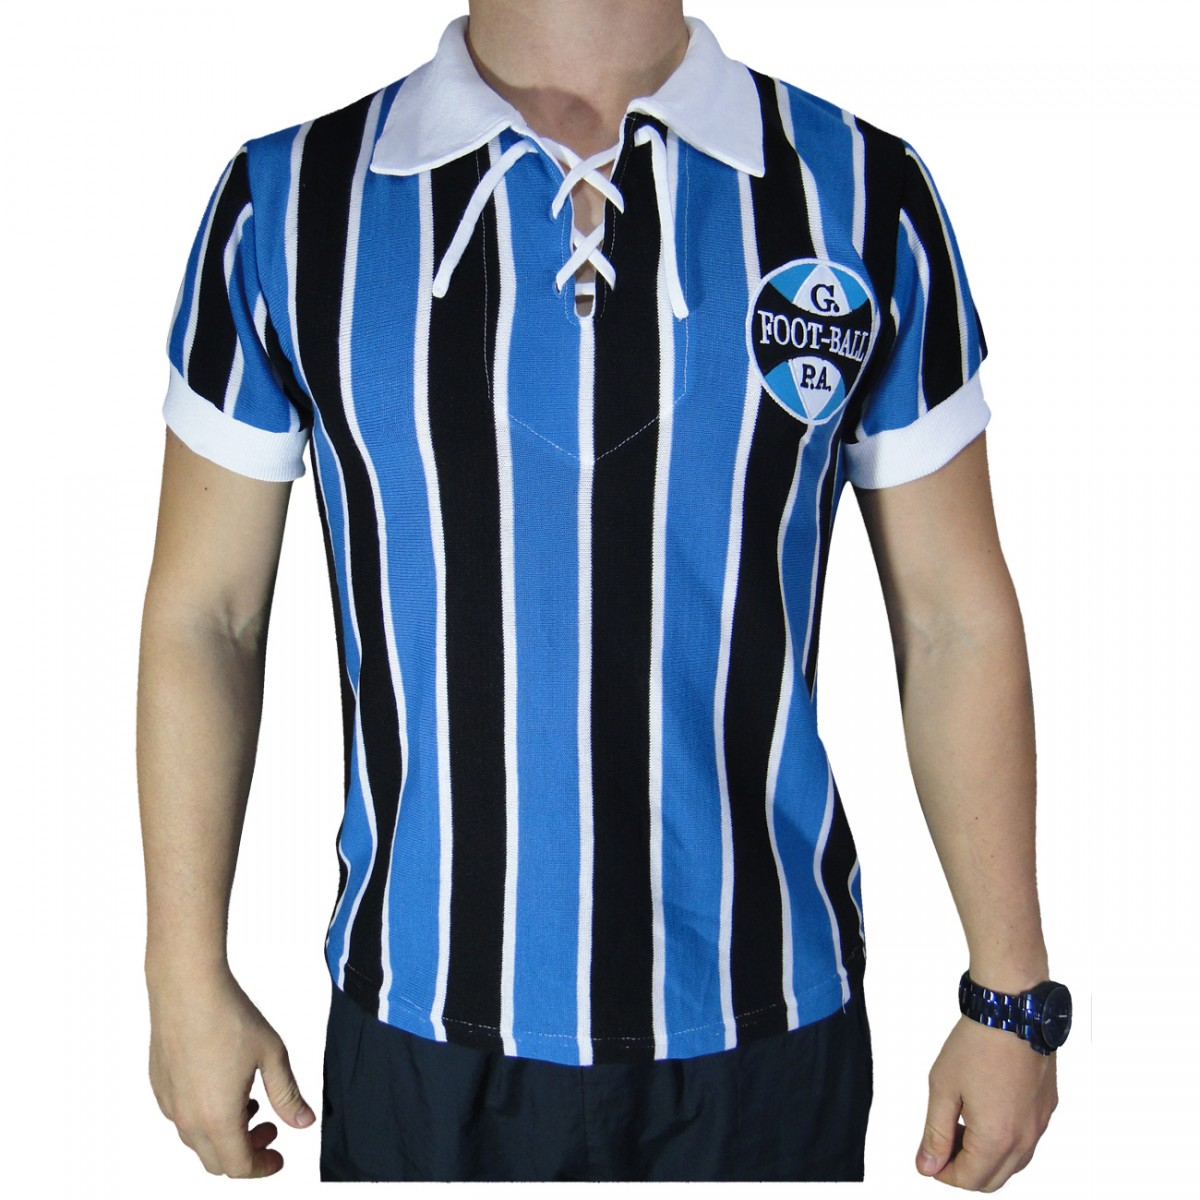 Camisa Gremio Uniforme 1929 Retro G5280 - Tricolor - Chuteira Nike ... 969e25a3174aa